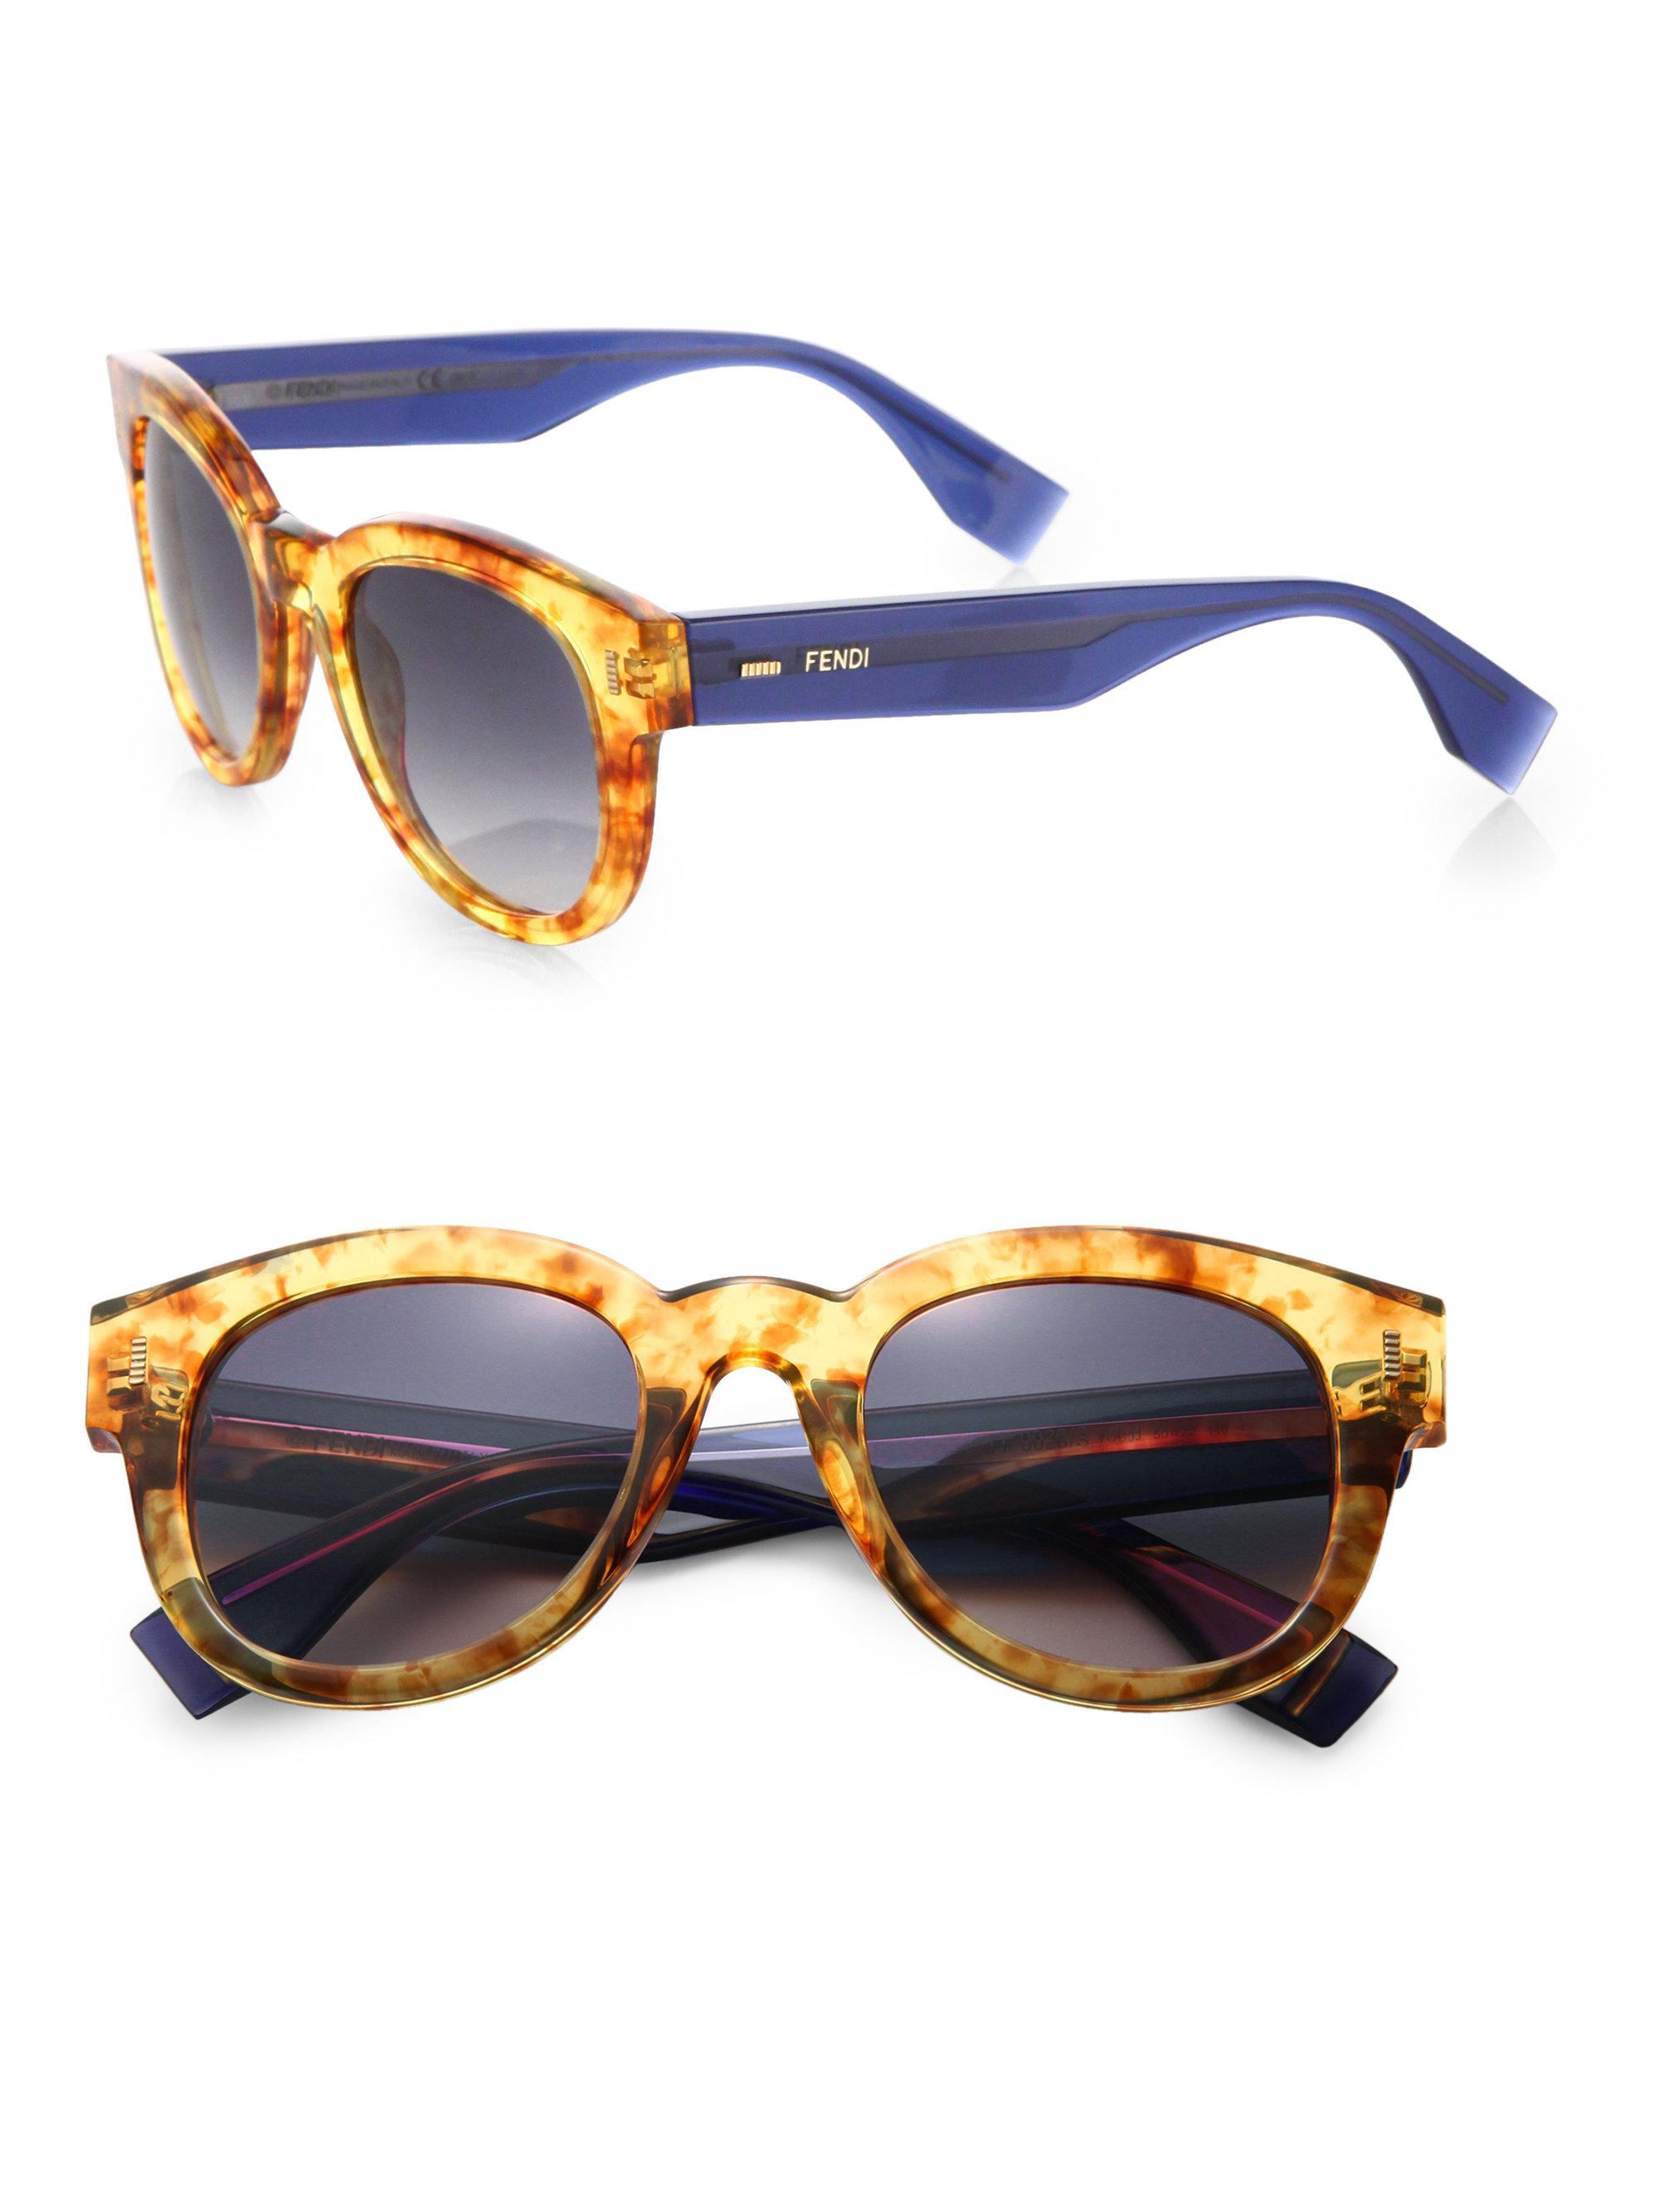 de5939d56f Fendi Colorblock Square Acetate Sunglasses - Lyst